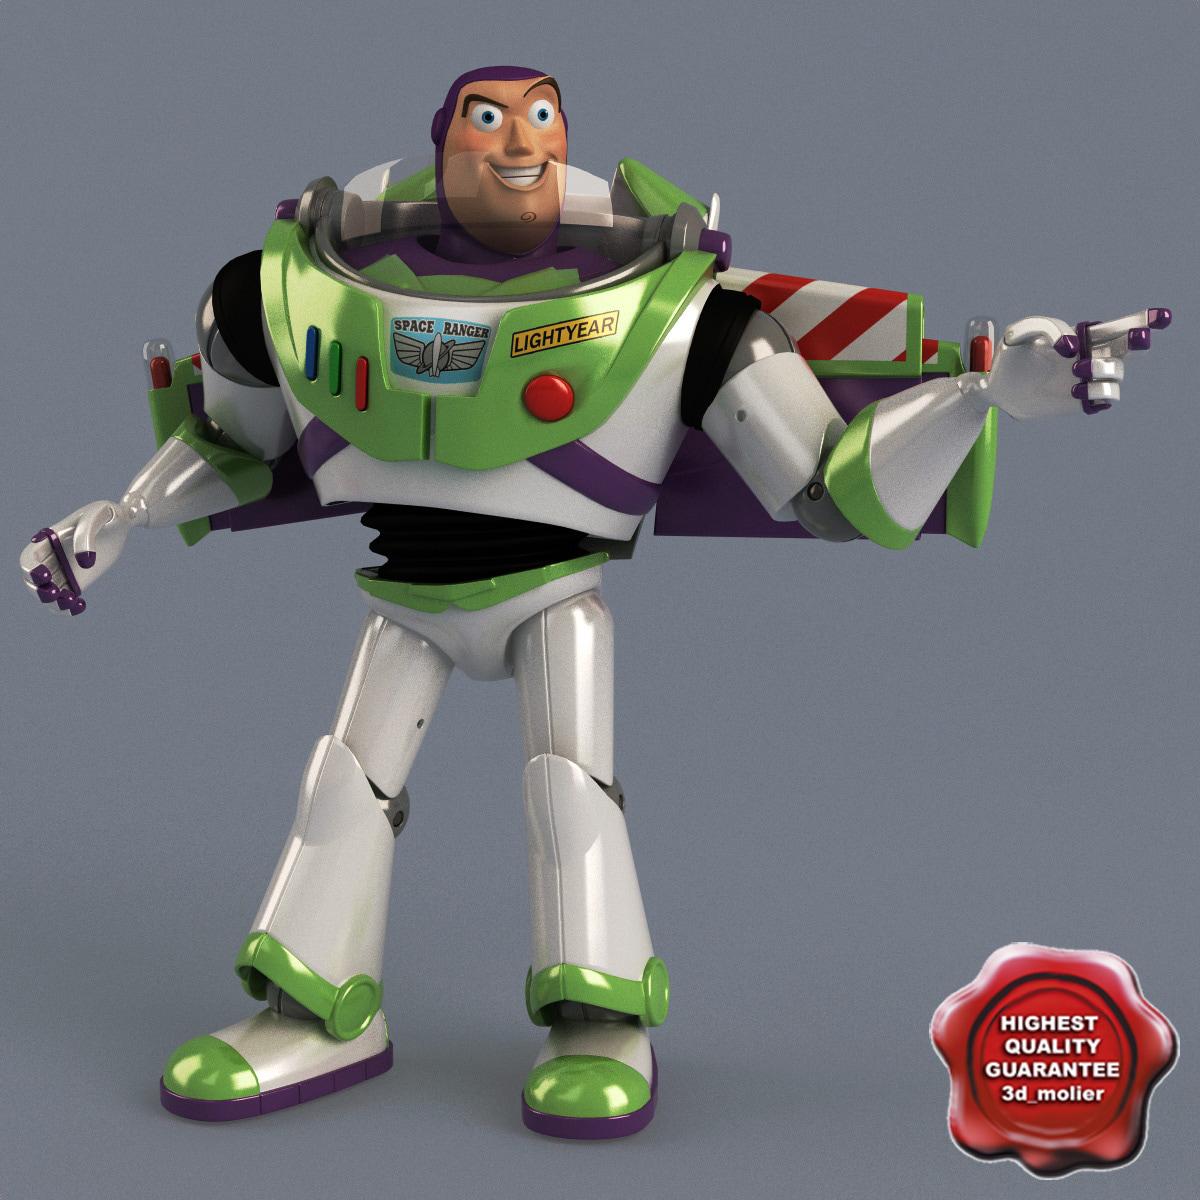 Buzz Lightyear Pose 2